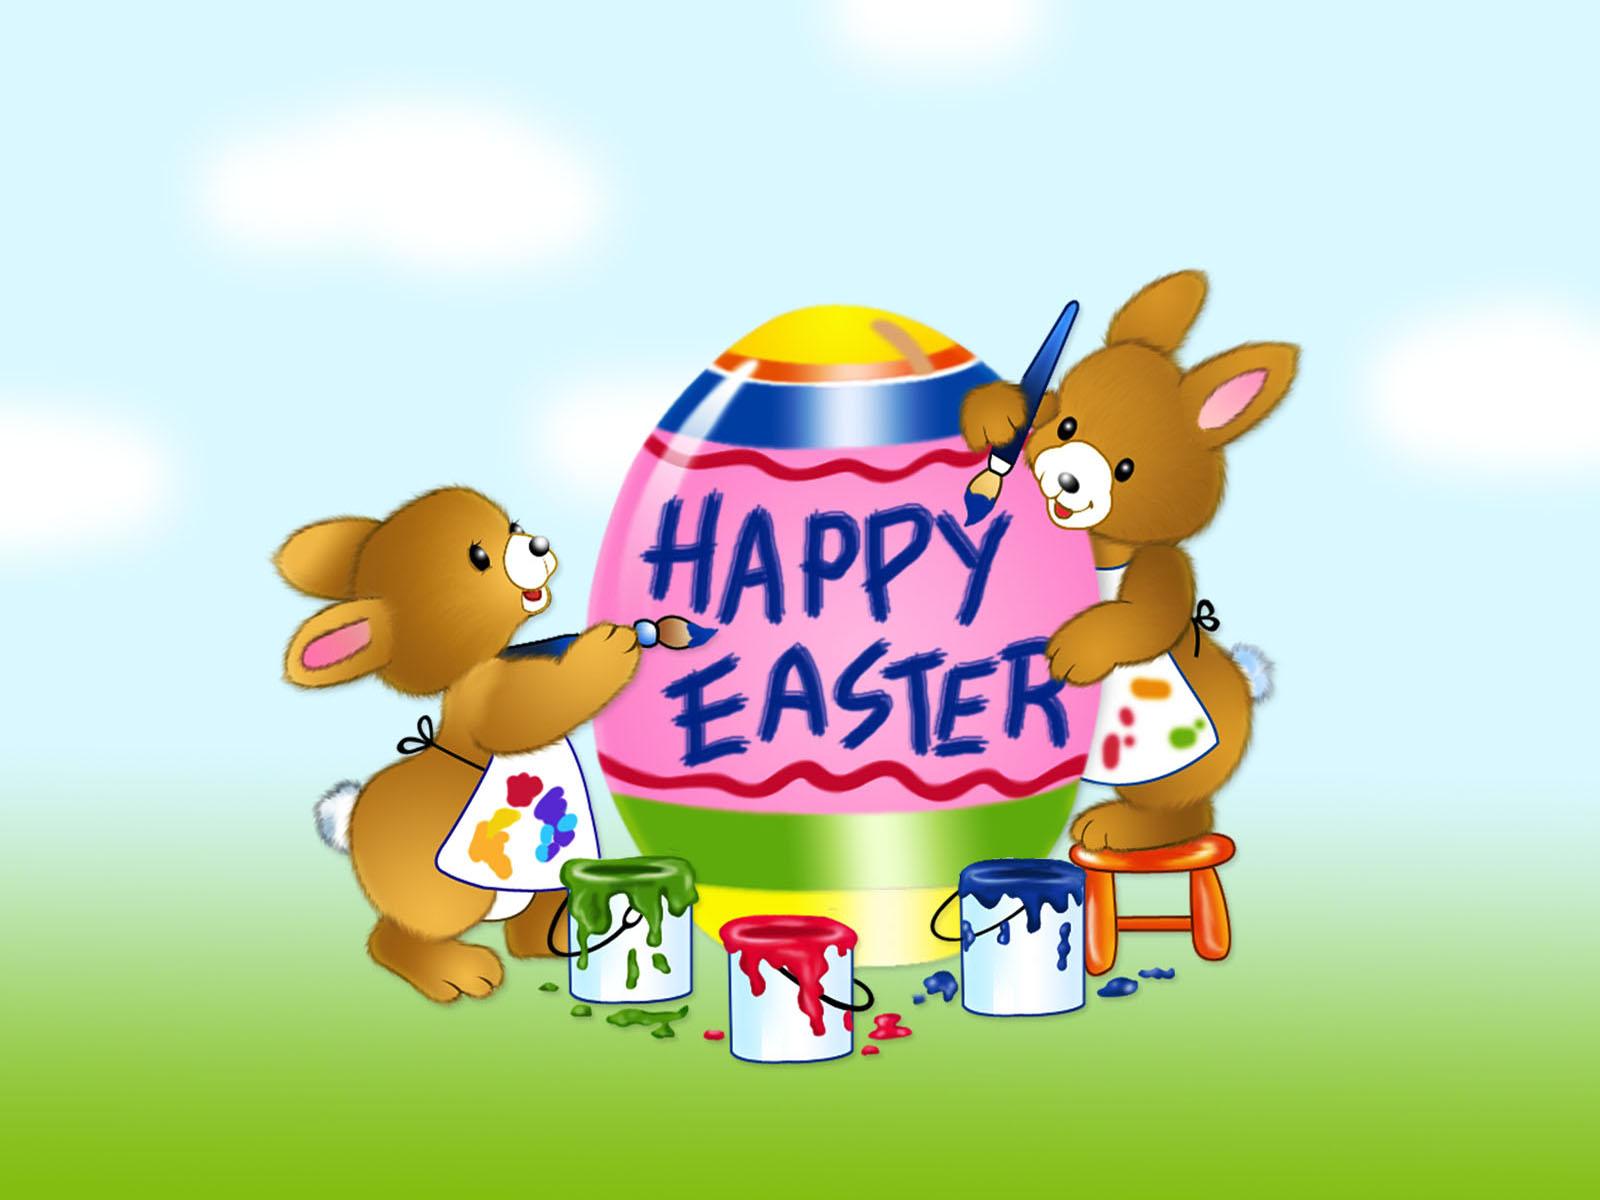 Wallpaper clipart easter Easter Download rabbit Easter happy